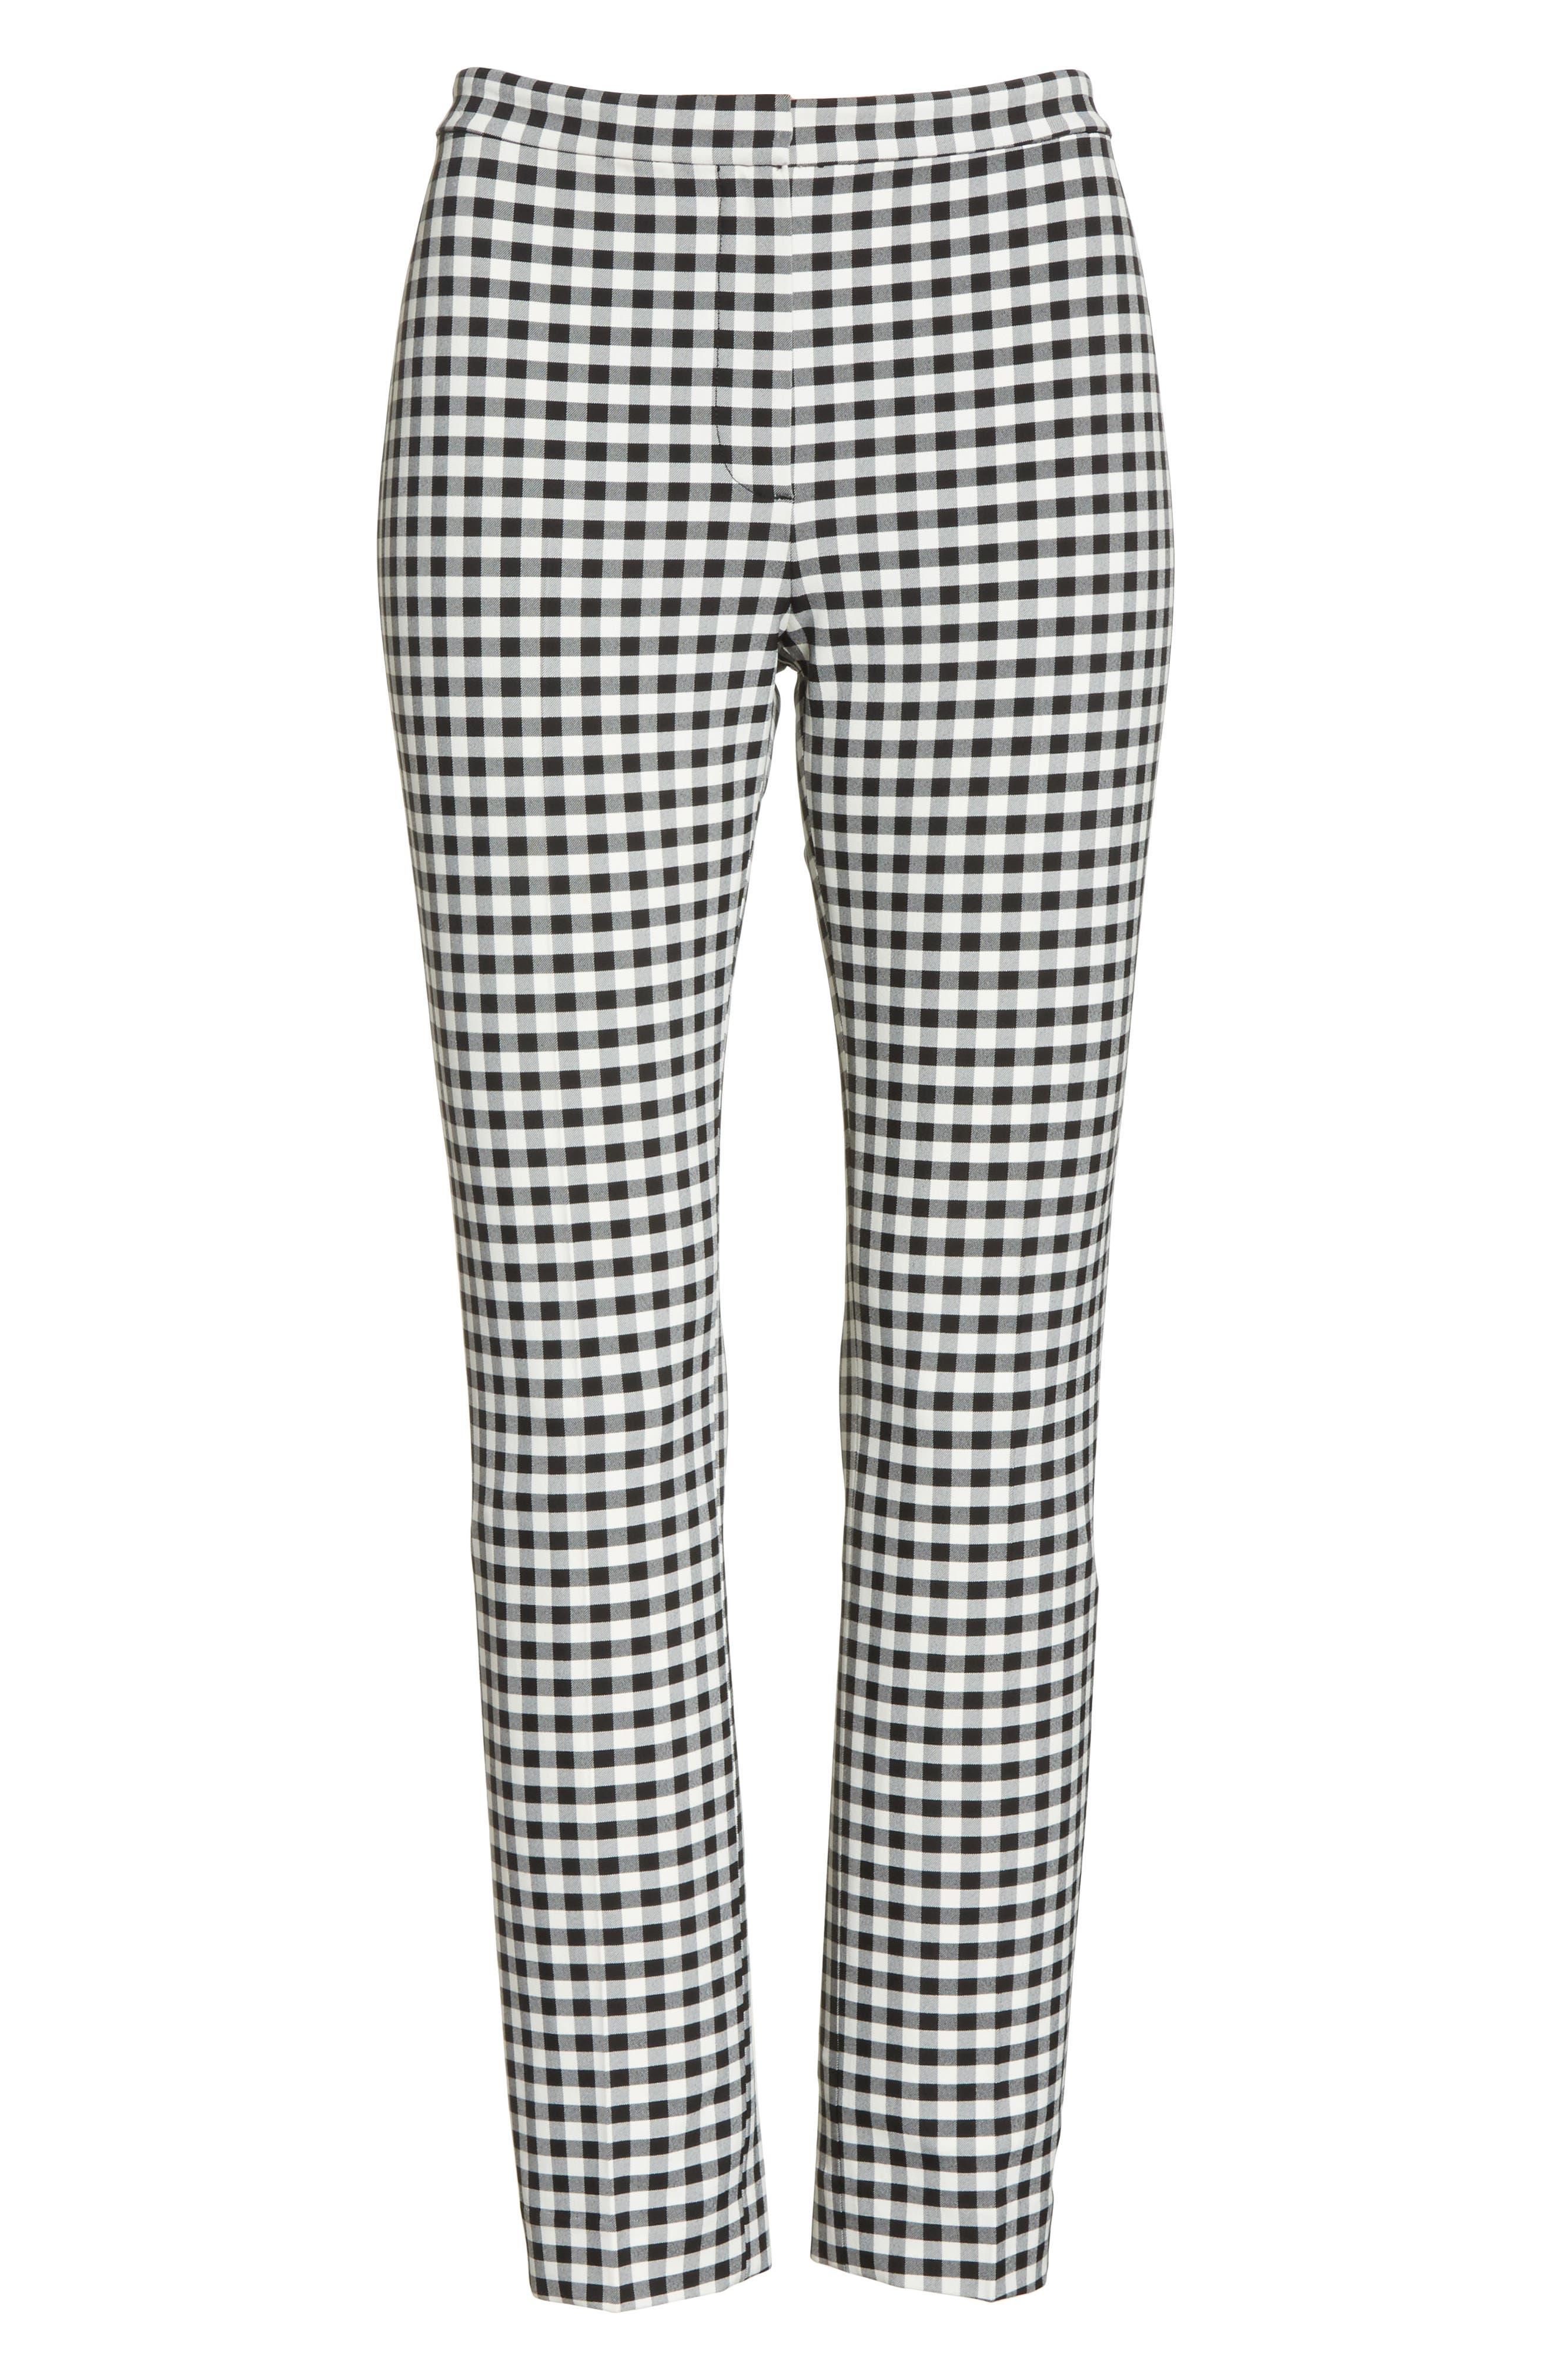 Gingham Classic Skinny Pants,                             Alternate thumbnail 6, color,                             Black/ White